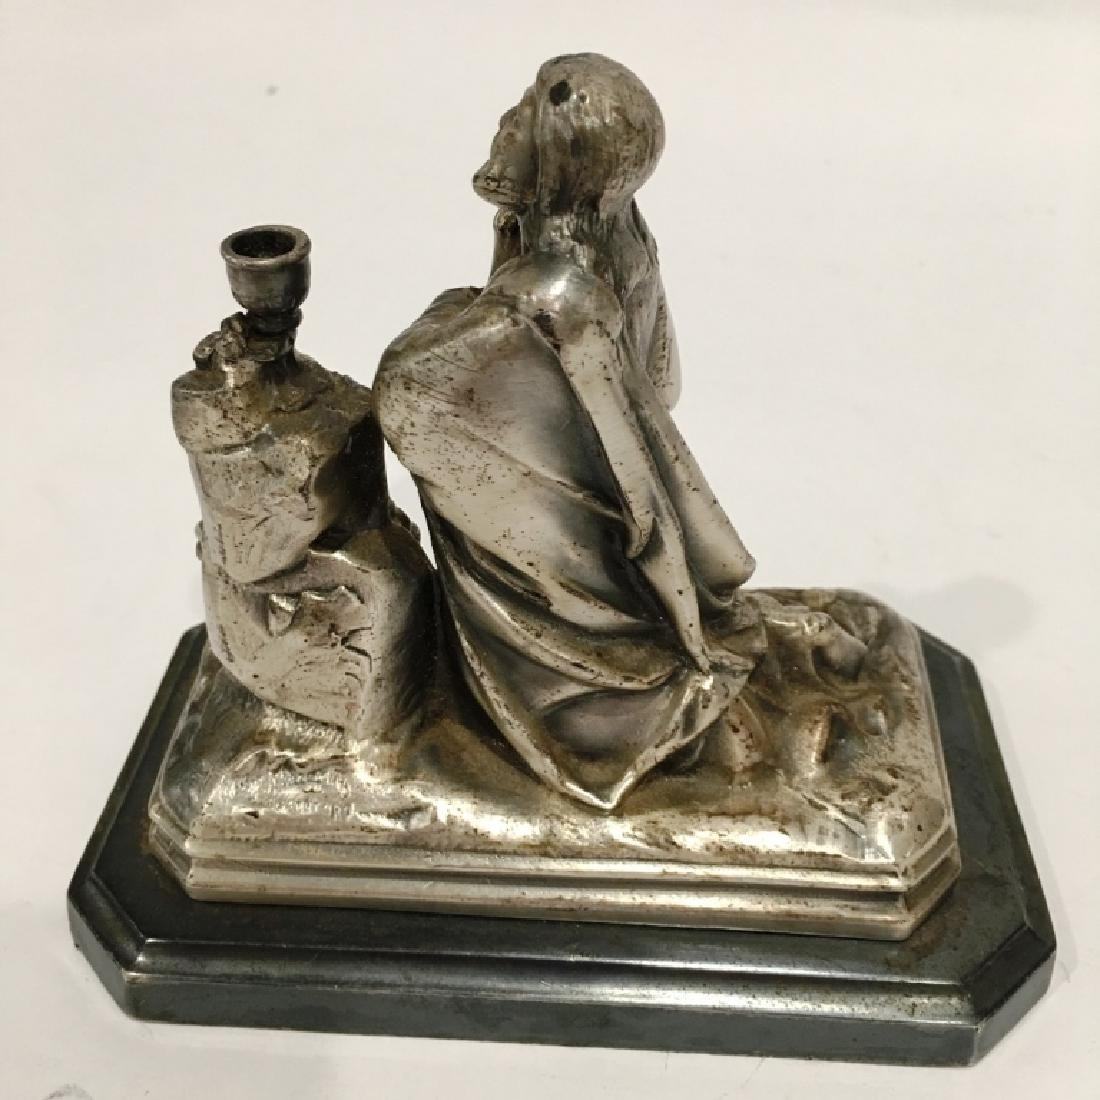 SILVER KNEELING RELIGIOUS FIGURE - 2